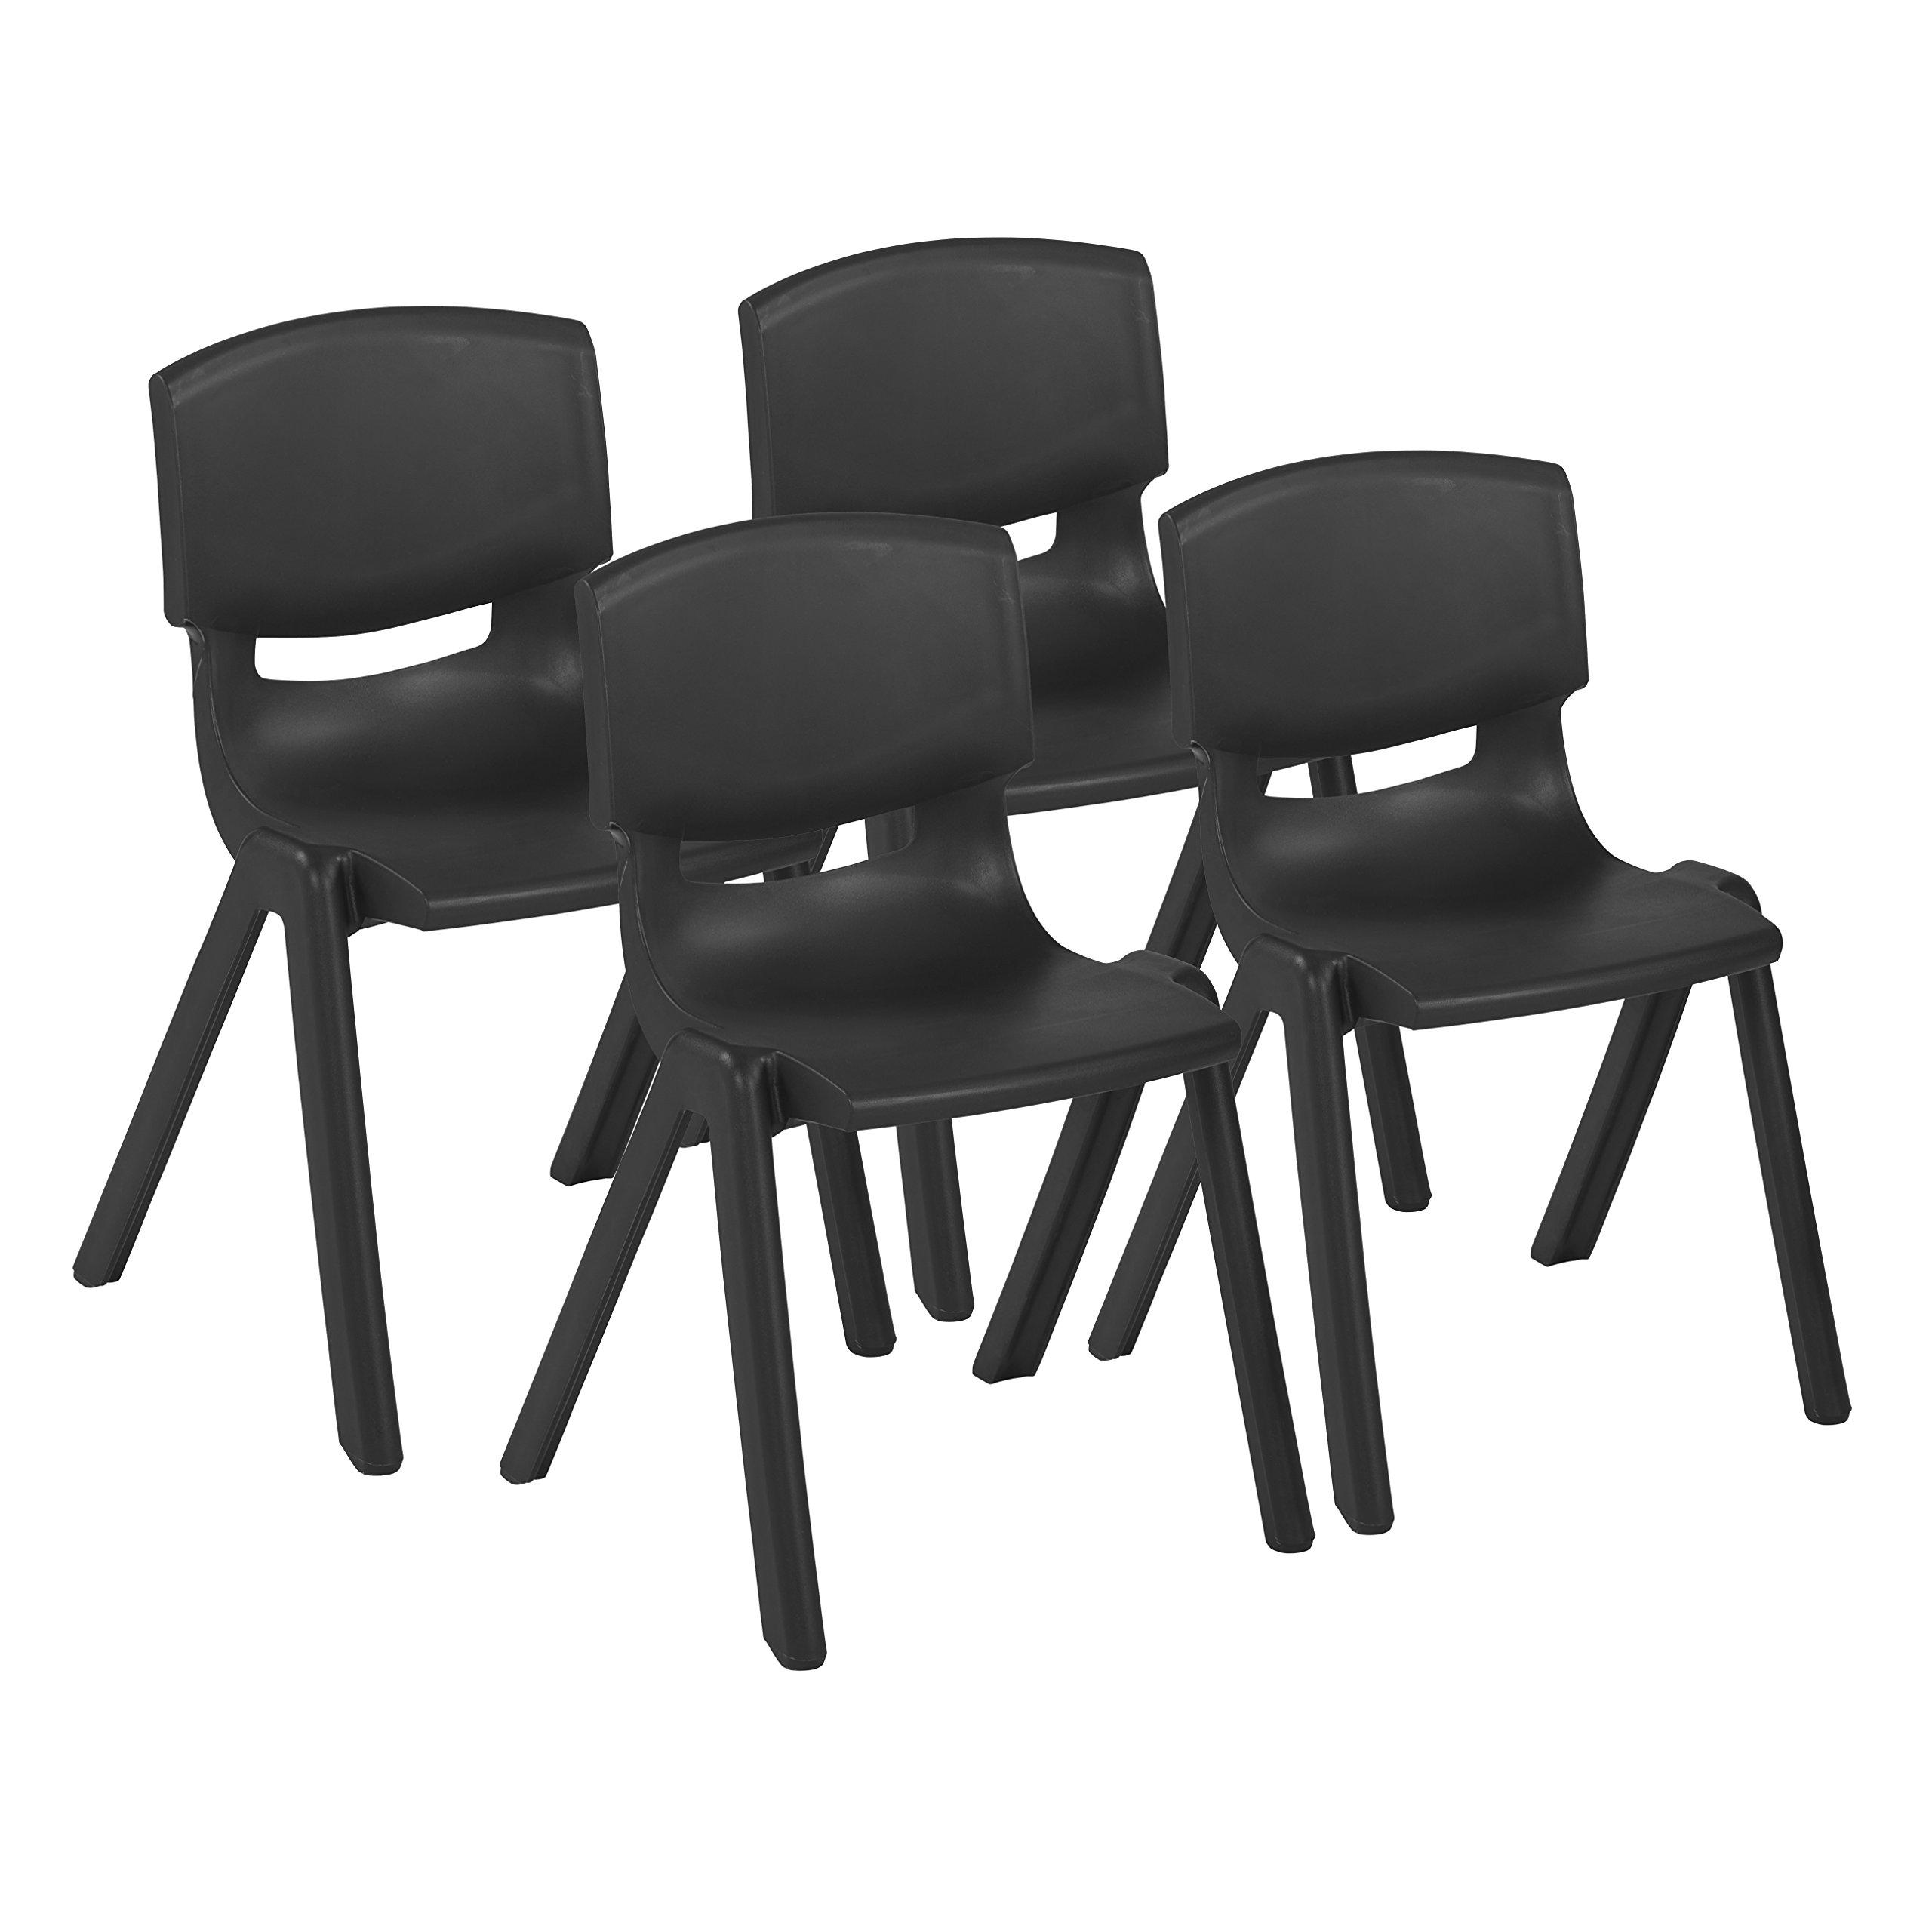 ECR4Kids 18'' School Stack Resin Chair, Black (4-Pack)